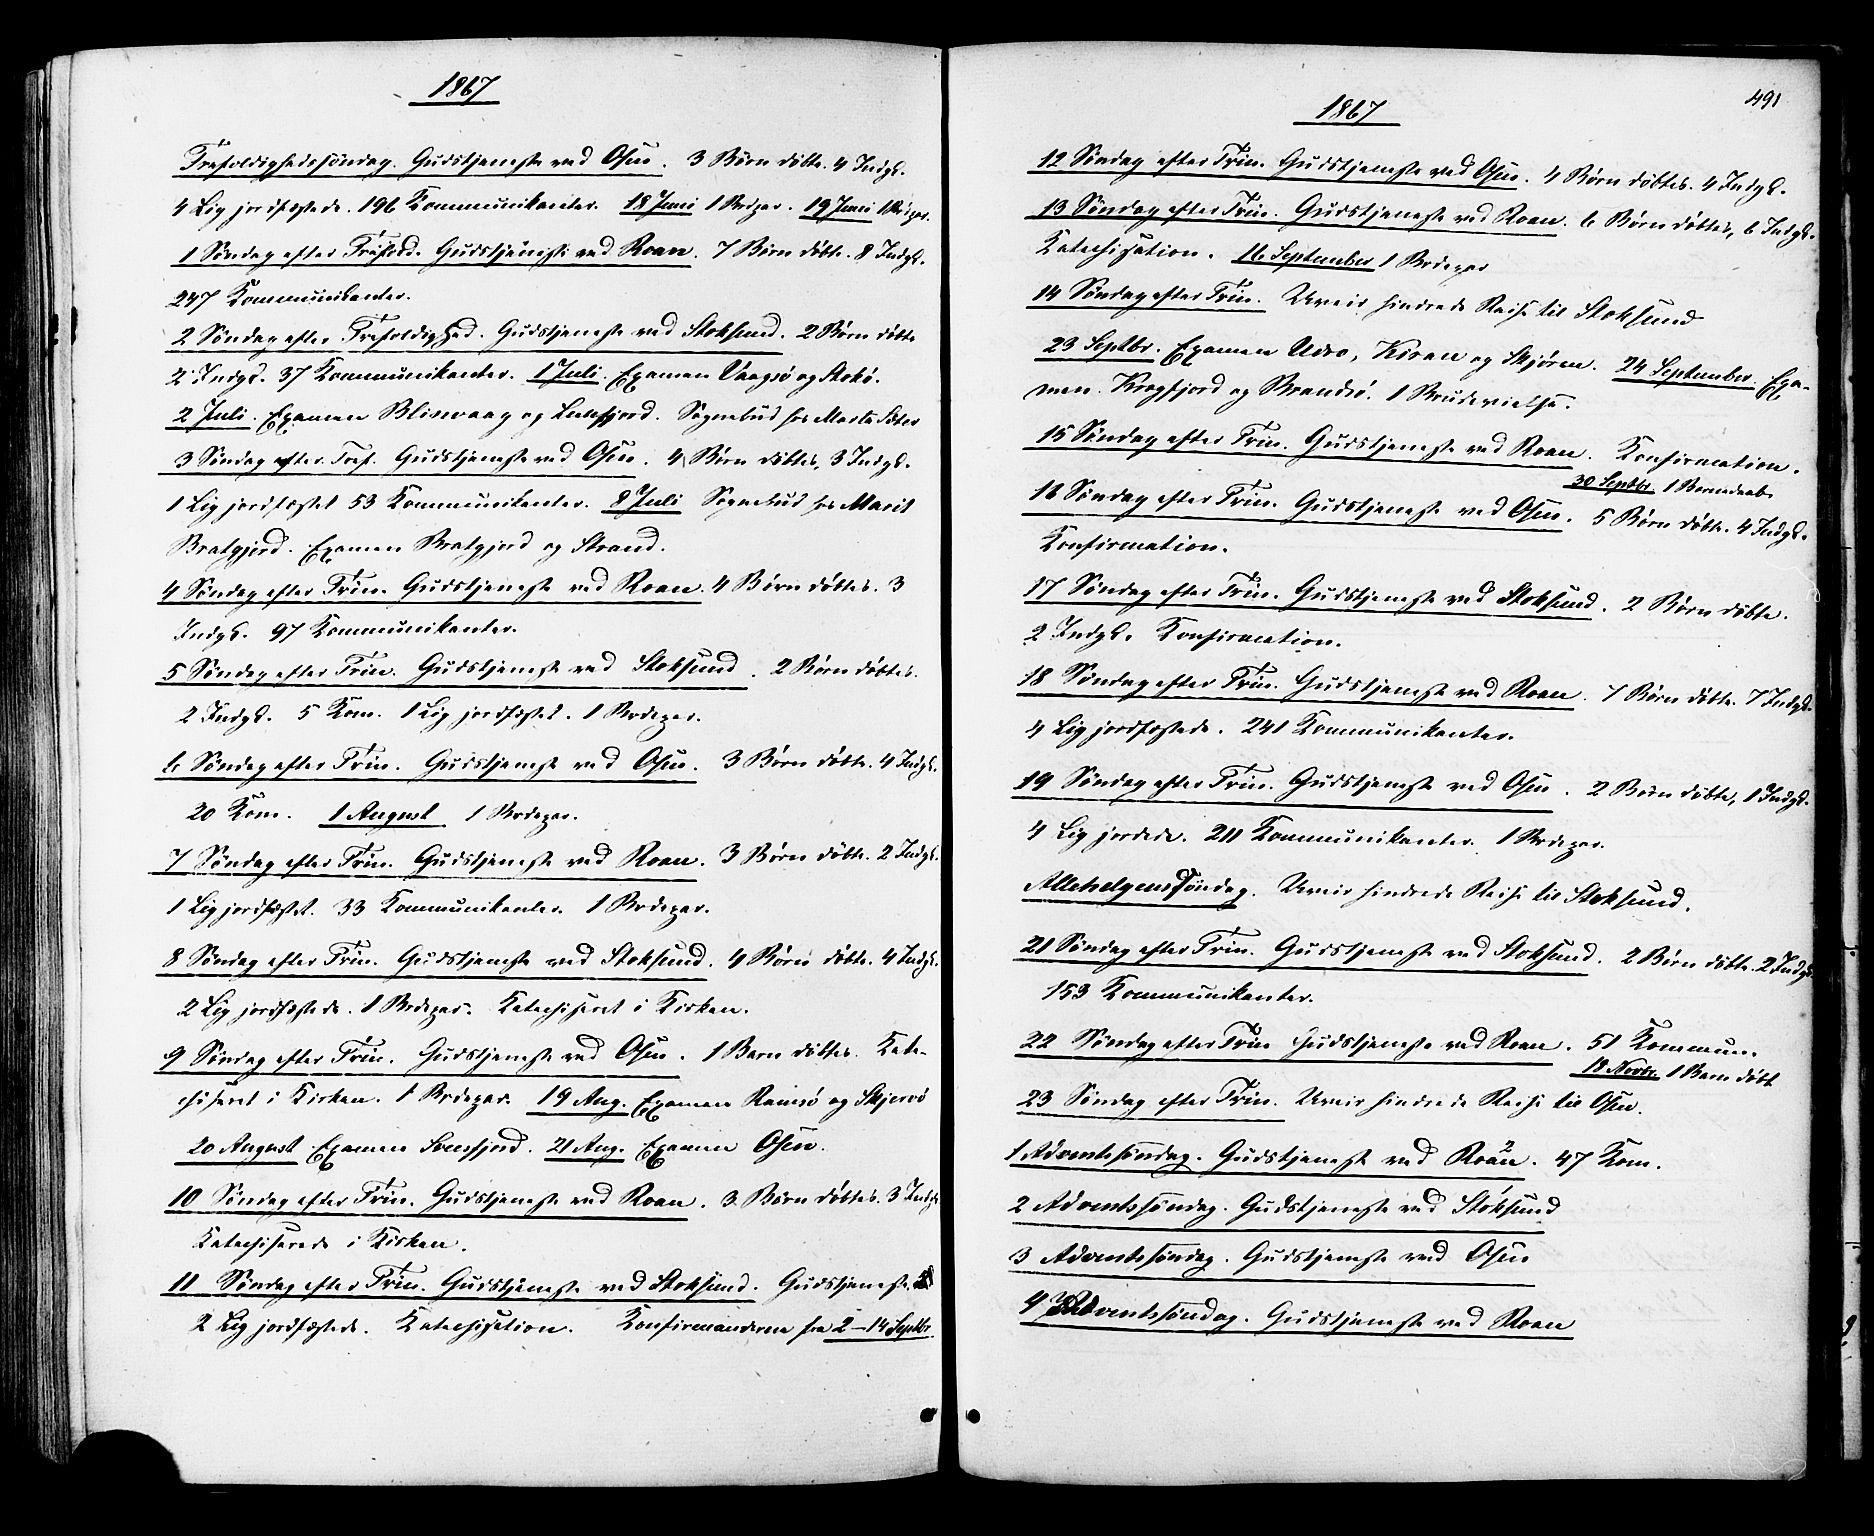 SAT, Ministerialprotokoller, klokkerbøker og fødselsregistre - Sør-Trøndelag, 657/L0706: Parish register (official) no. 657A07, 1867-1878, p. 491